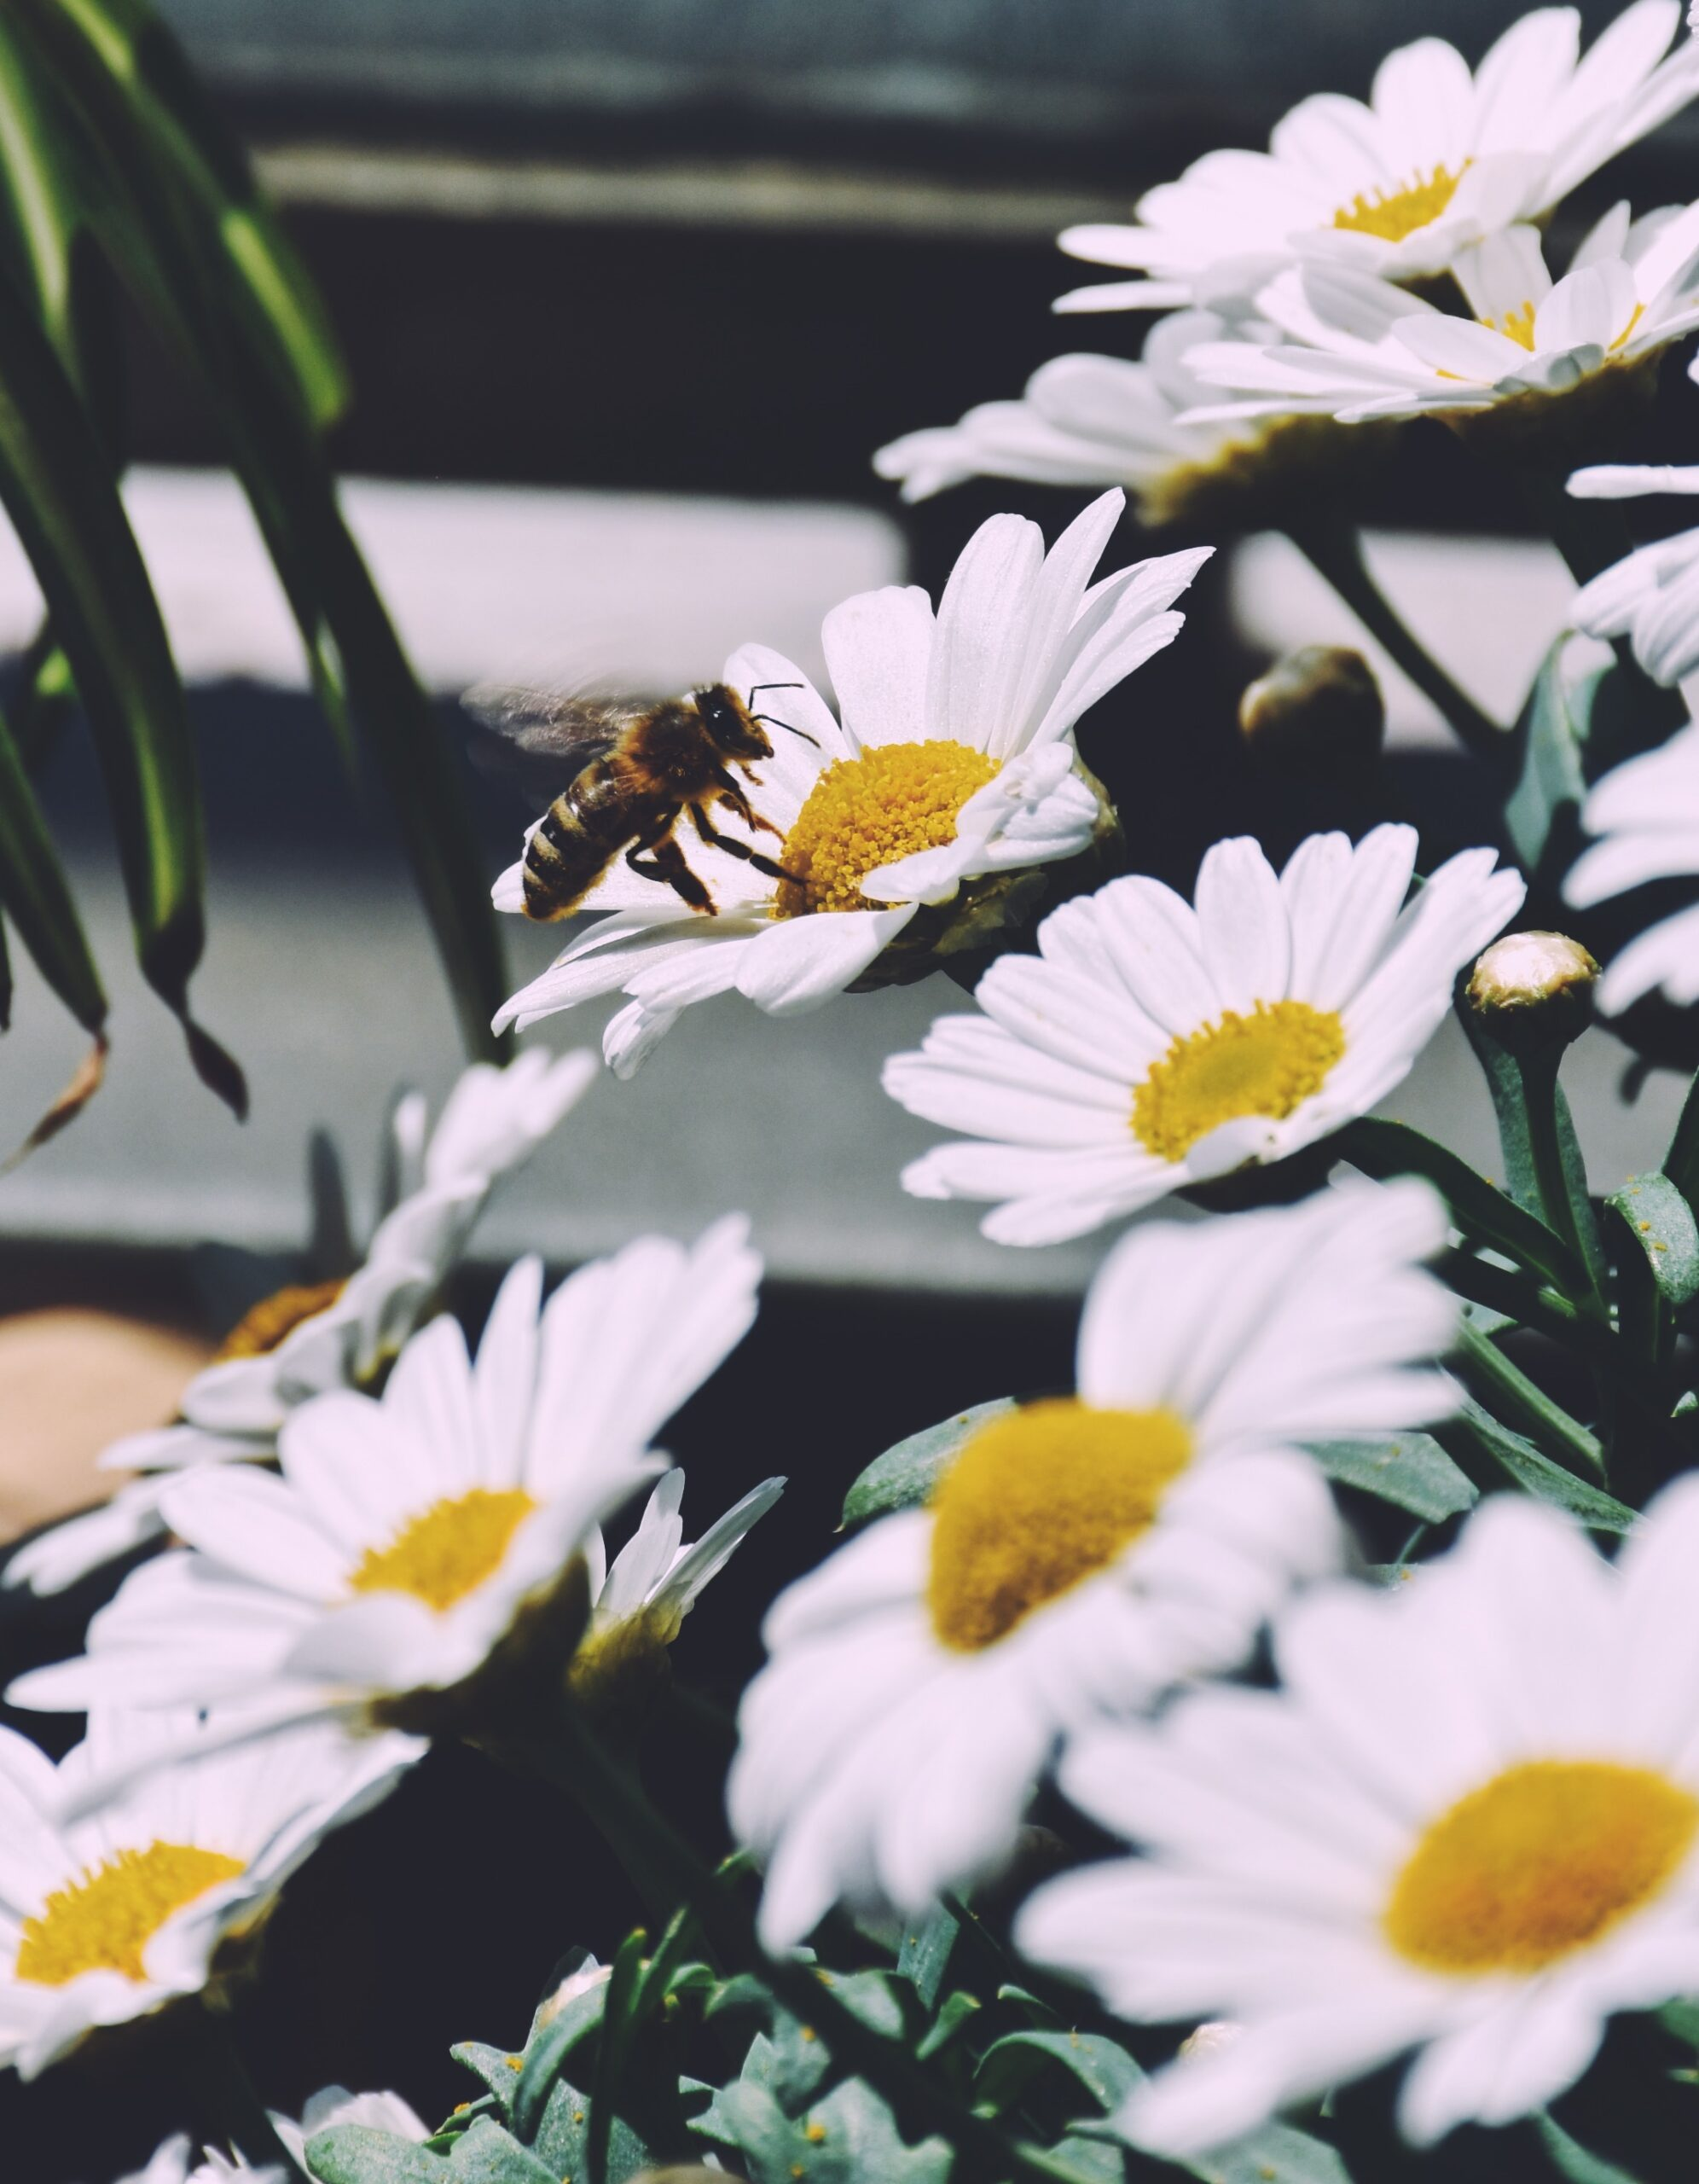 Bees in the urban garden